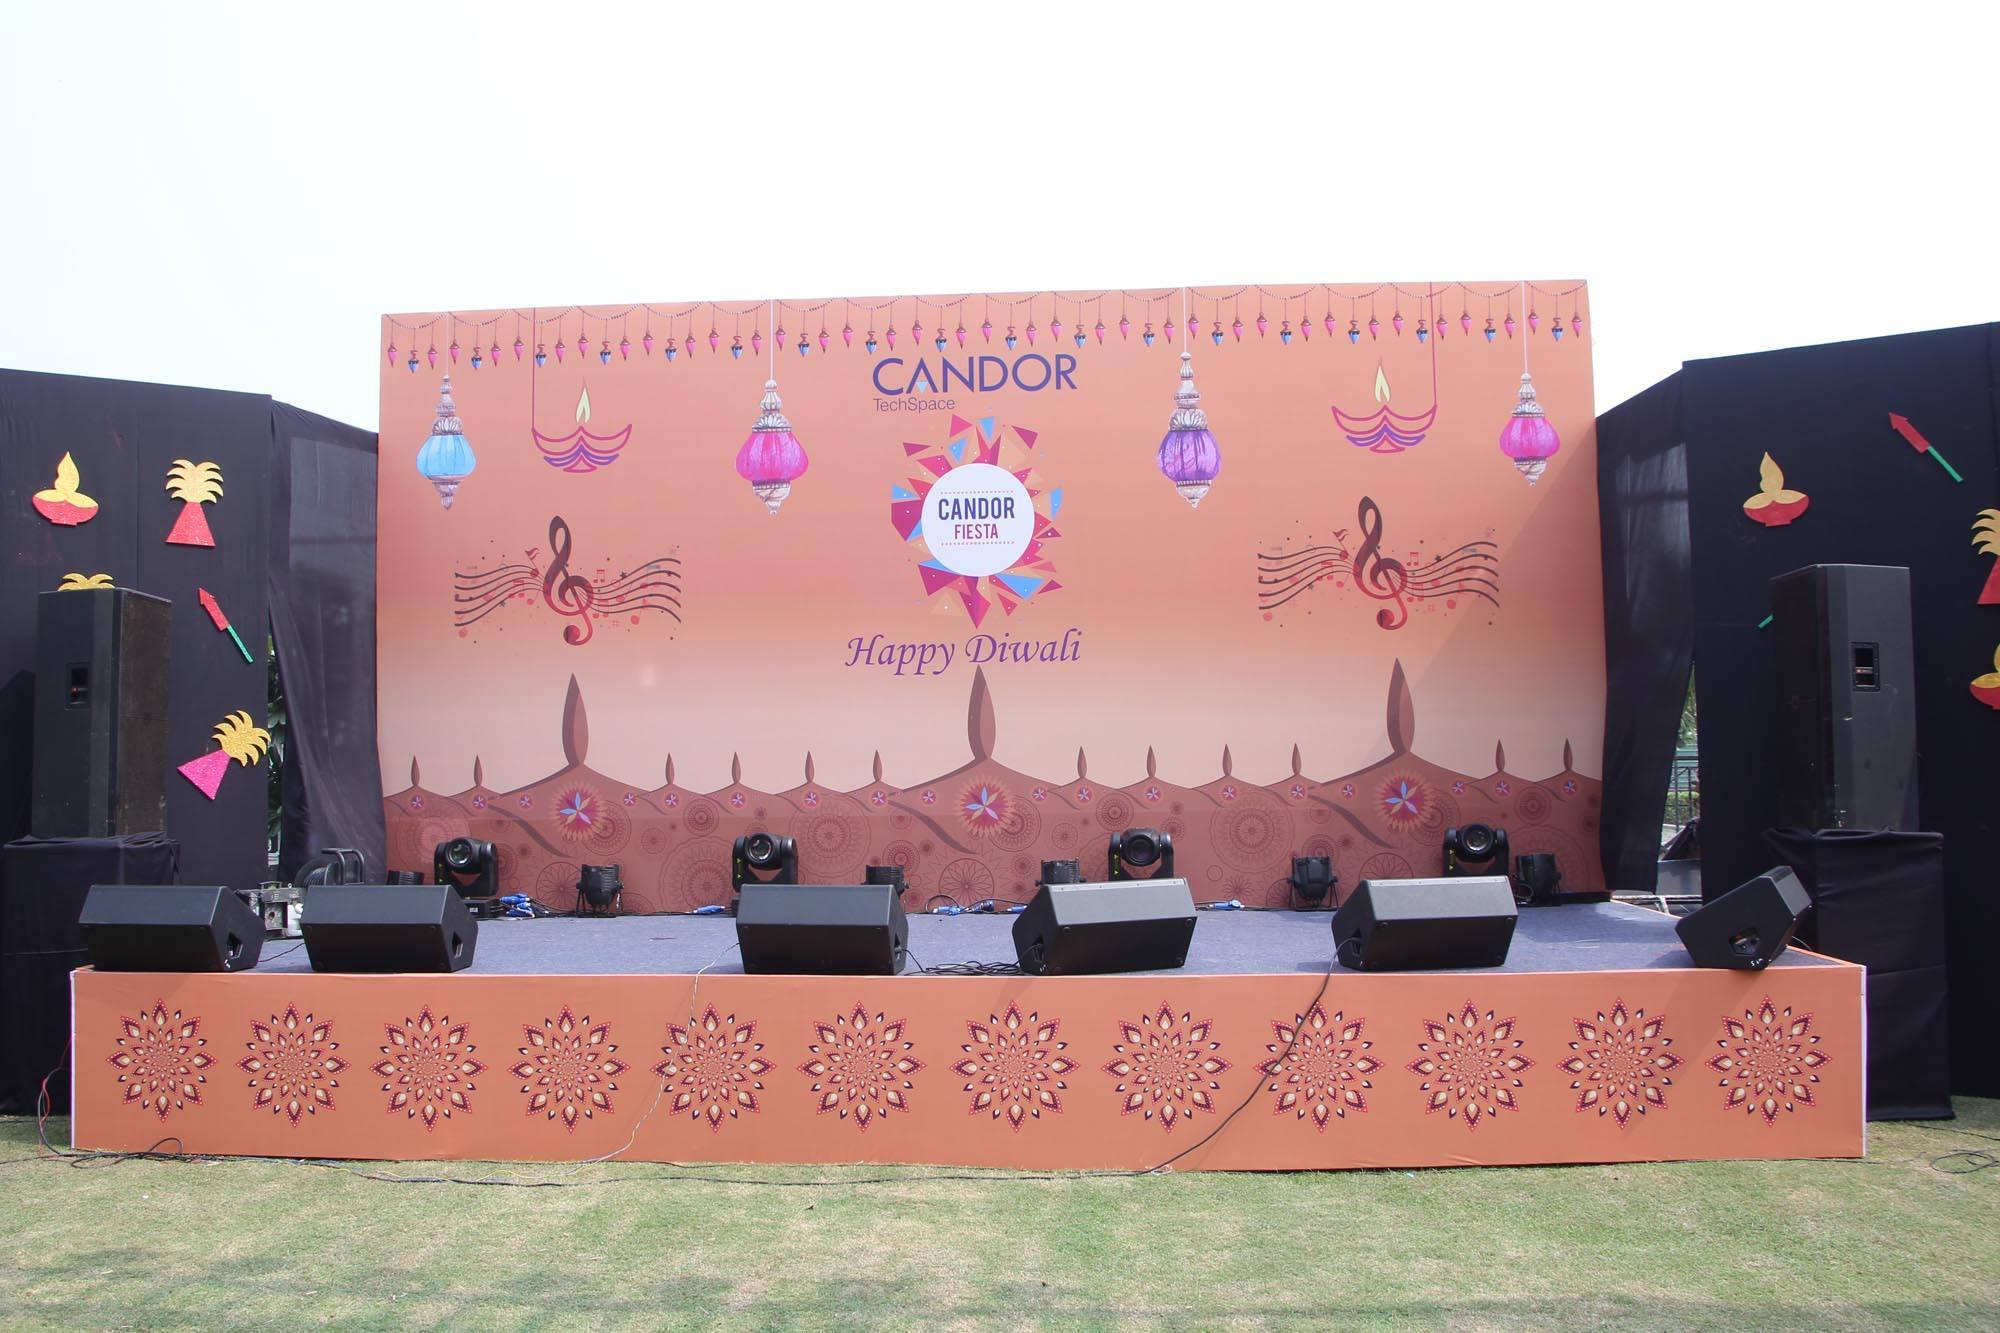 candor-diwali-Noida-62-8.jpg